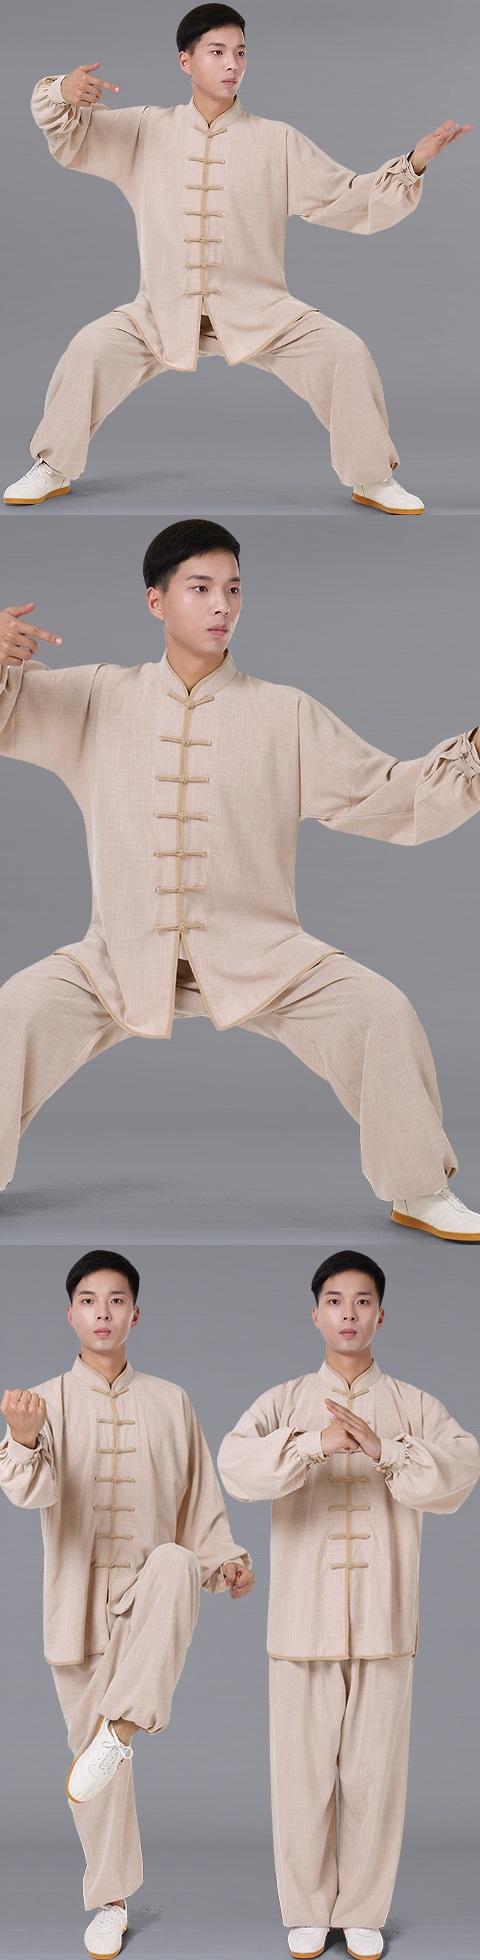 Professional Bamboo Linen Taichi Kungfu Uniform with Pants (RM)